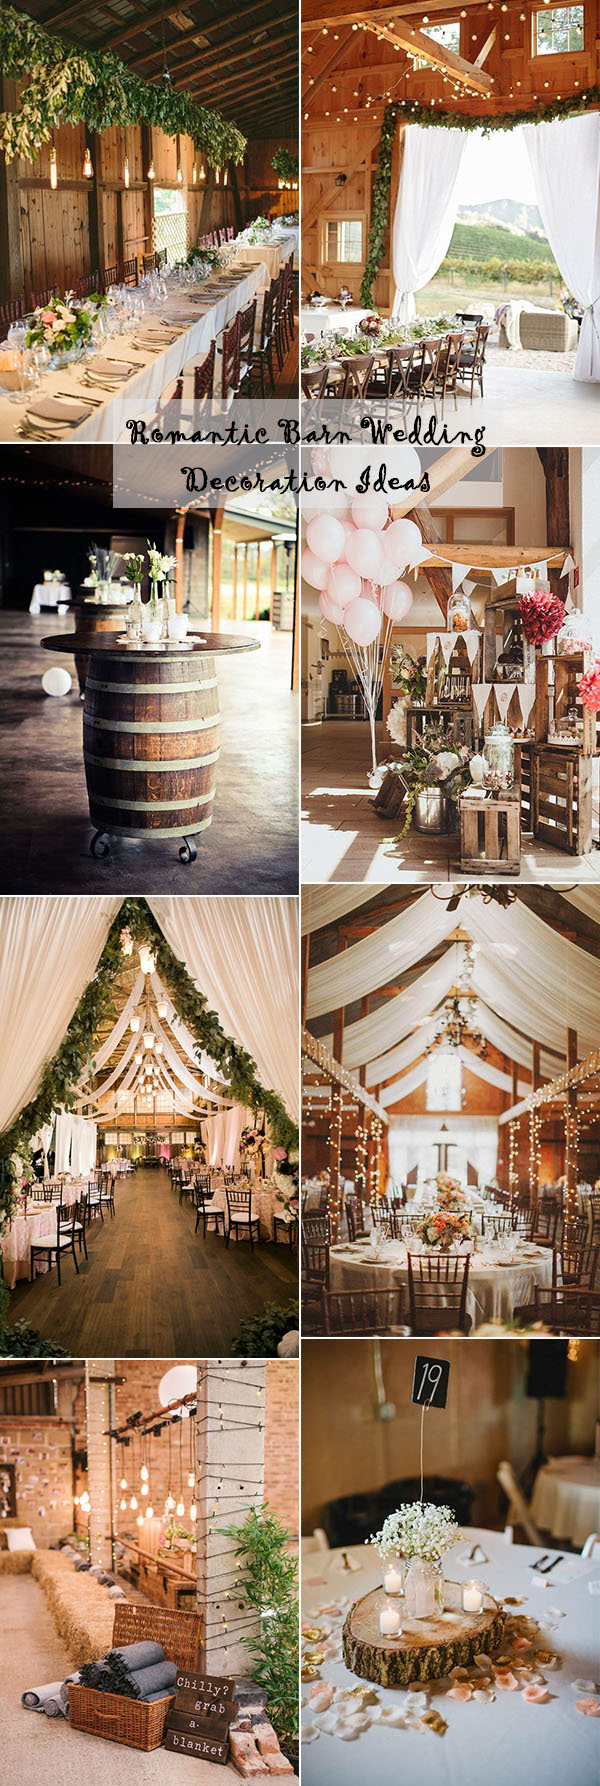 Rustic Wedding Ideas 25 Sweet And Romantic Rustic Barn Wedding Decoration Ideas